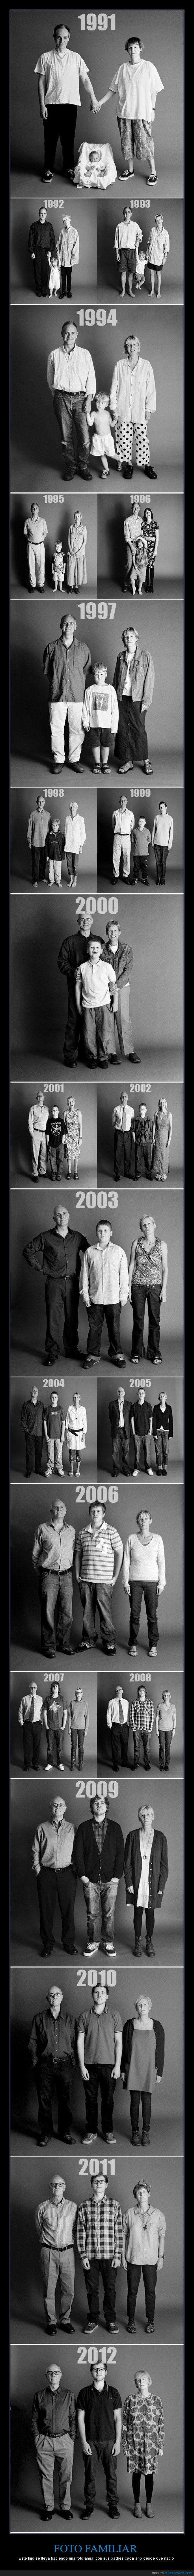 año,blanco y negro,cada,crecer,crecimento,evolucion,familia,foto,hijo,madre,padre